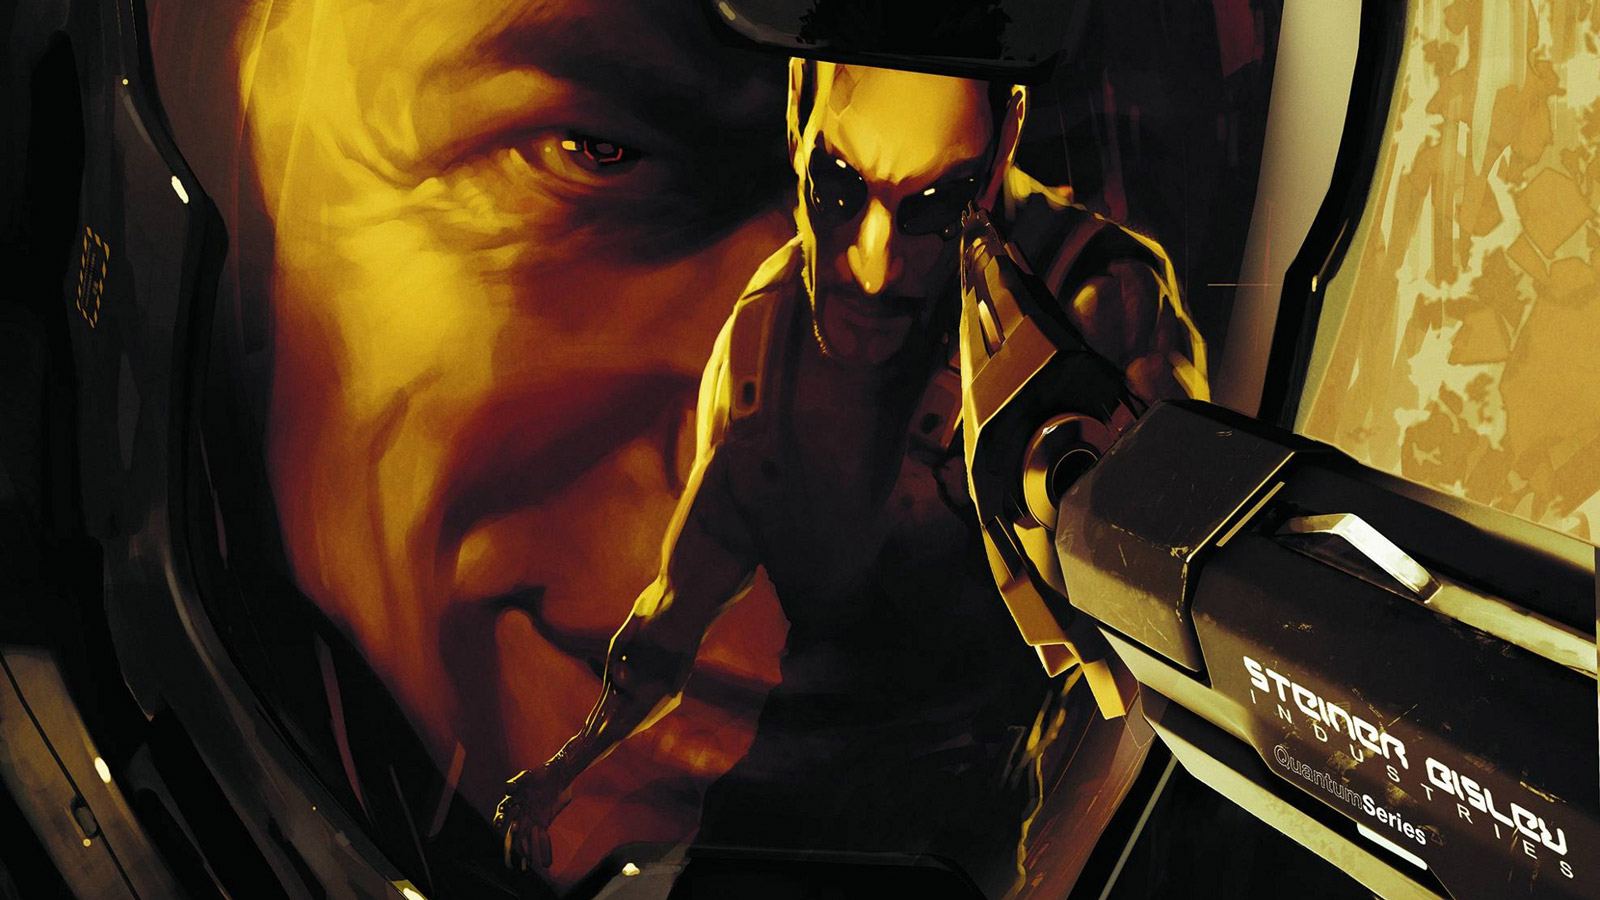 Free Deus Ex: Human Revolution Wallpaper in 1600x900